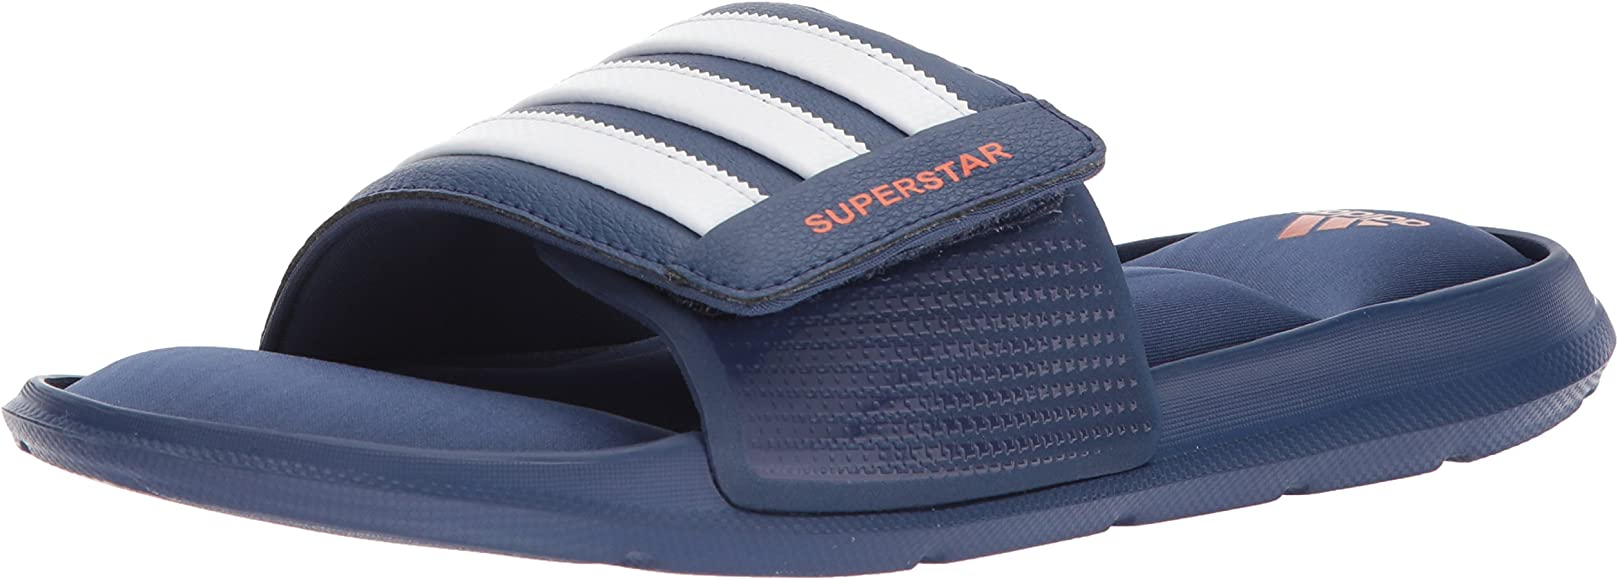 adidas Men's Superstar 5G Slide Sandal